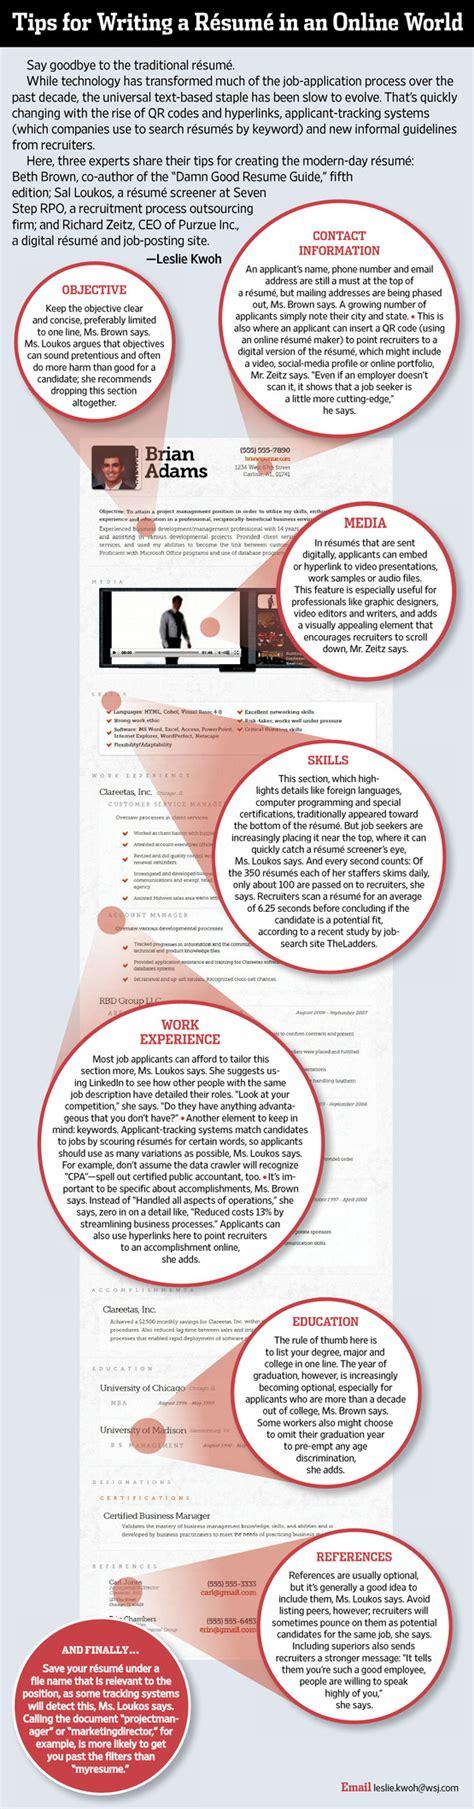 Resume Tips Wall Journal Wall Journal Brian Pr